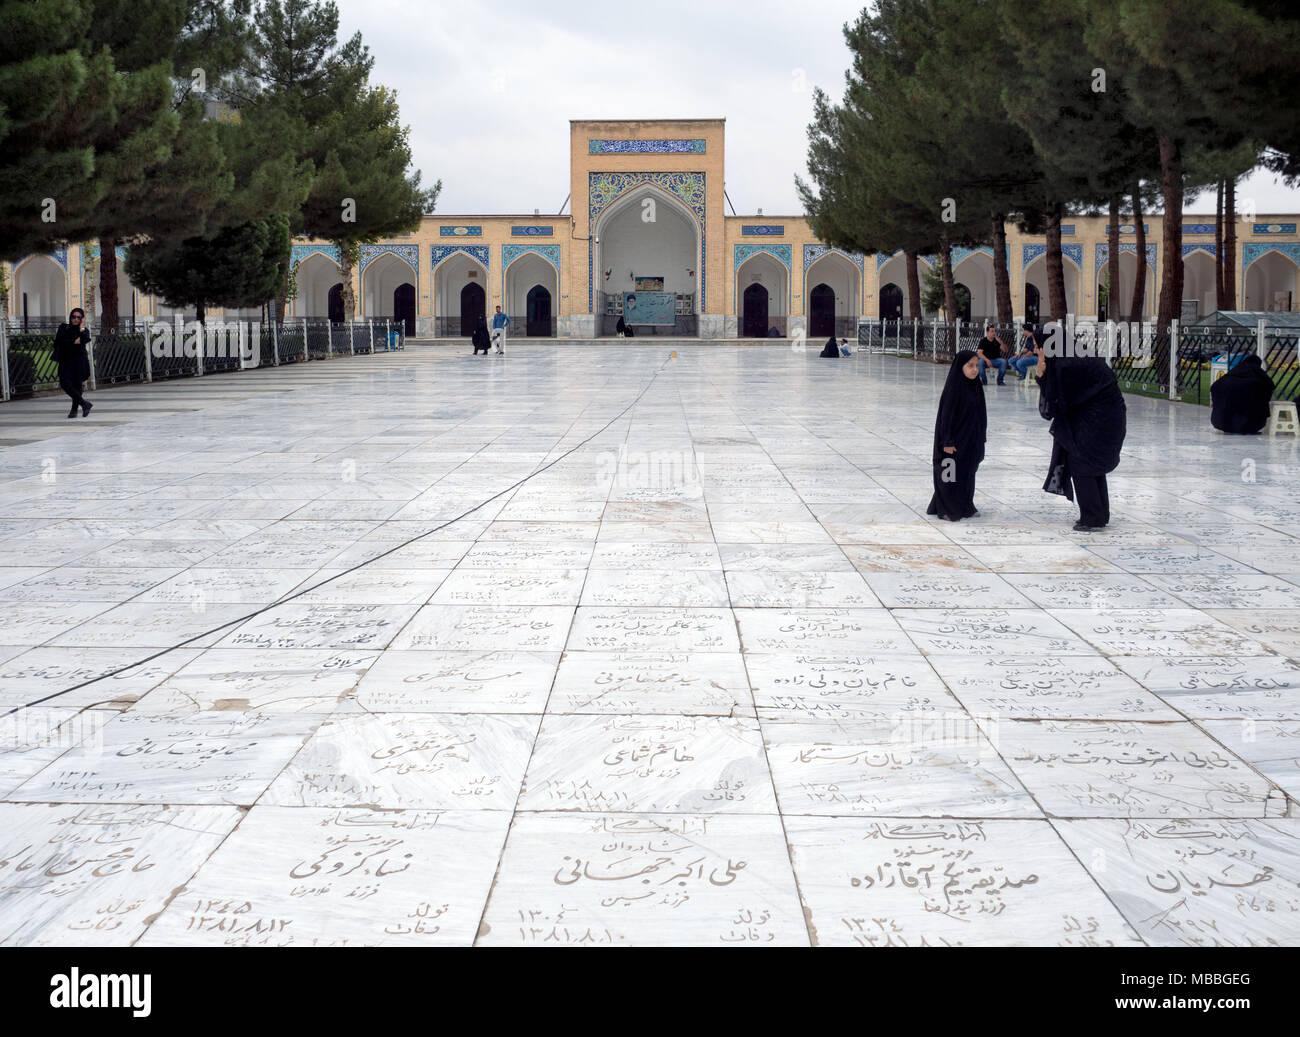 Muslim women in black at Khajeh Rabi Tomb cemetery, located along the Kashf River on the northern edge of Mashhad, Iran - Stock Image